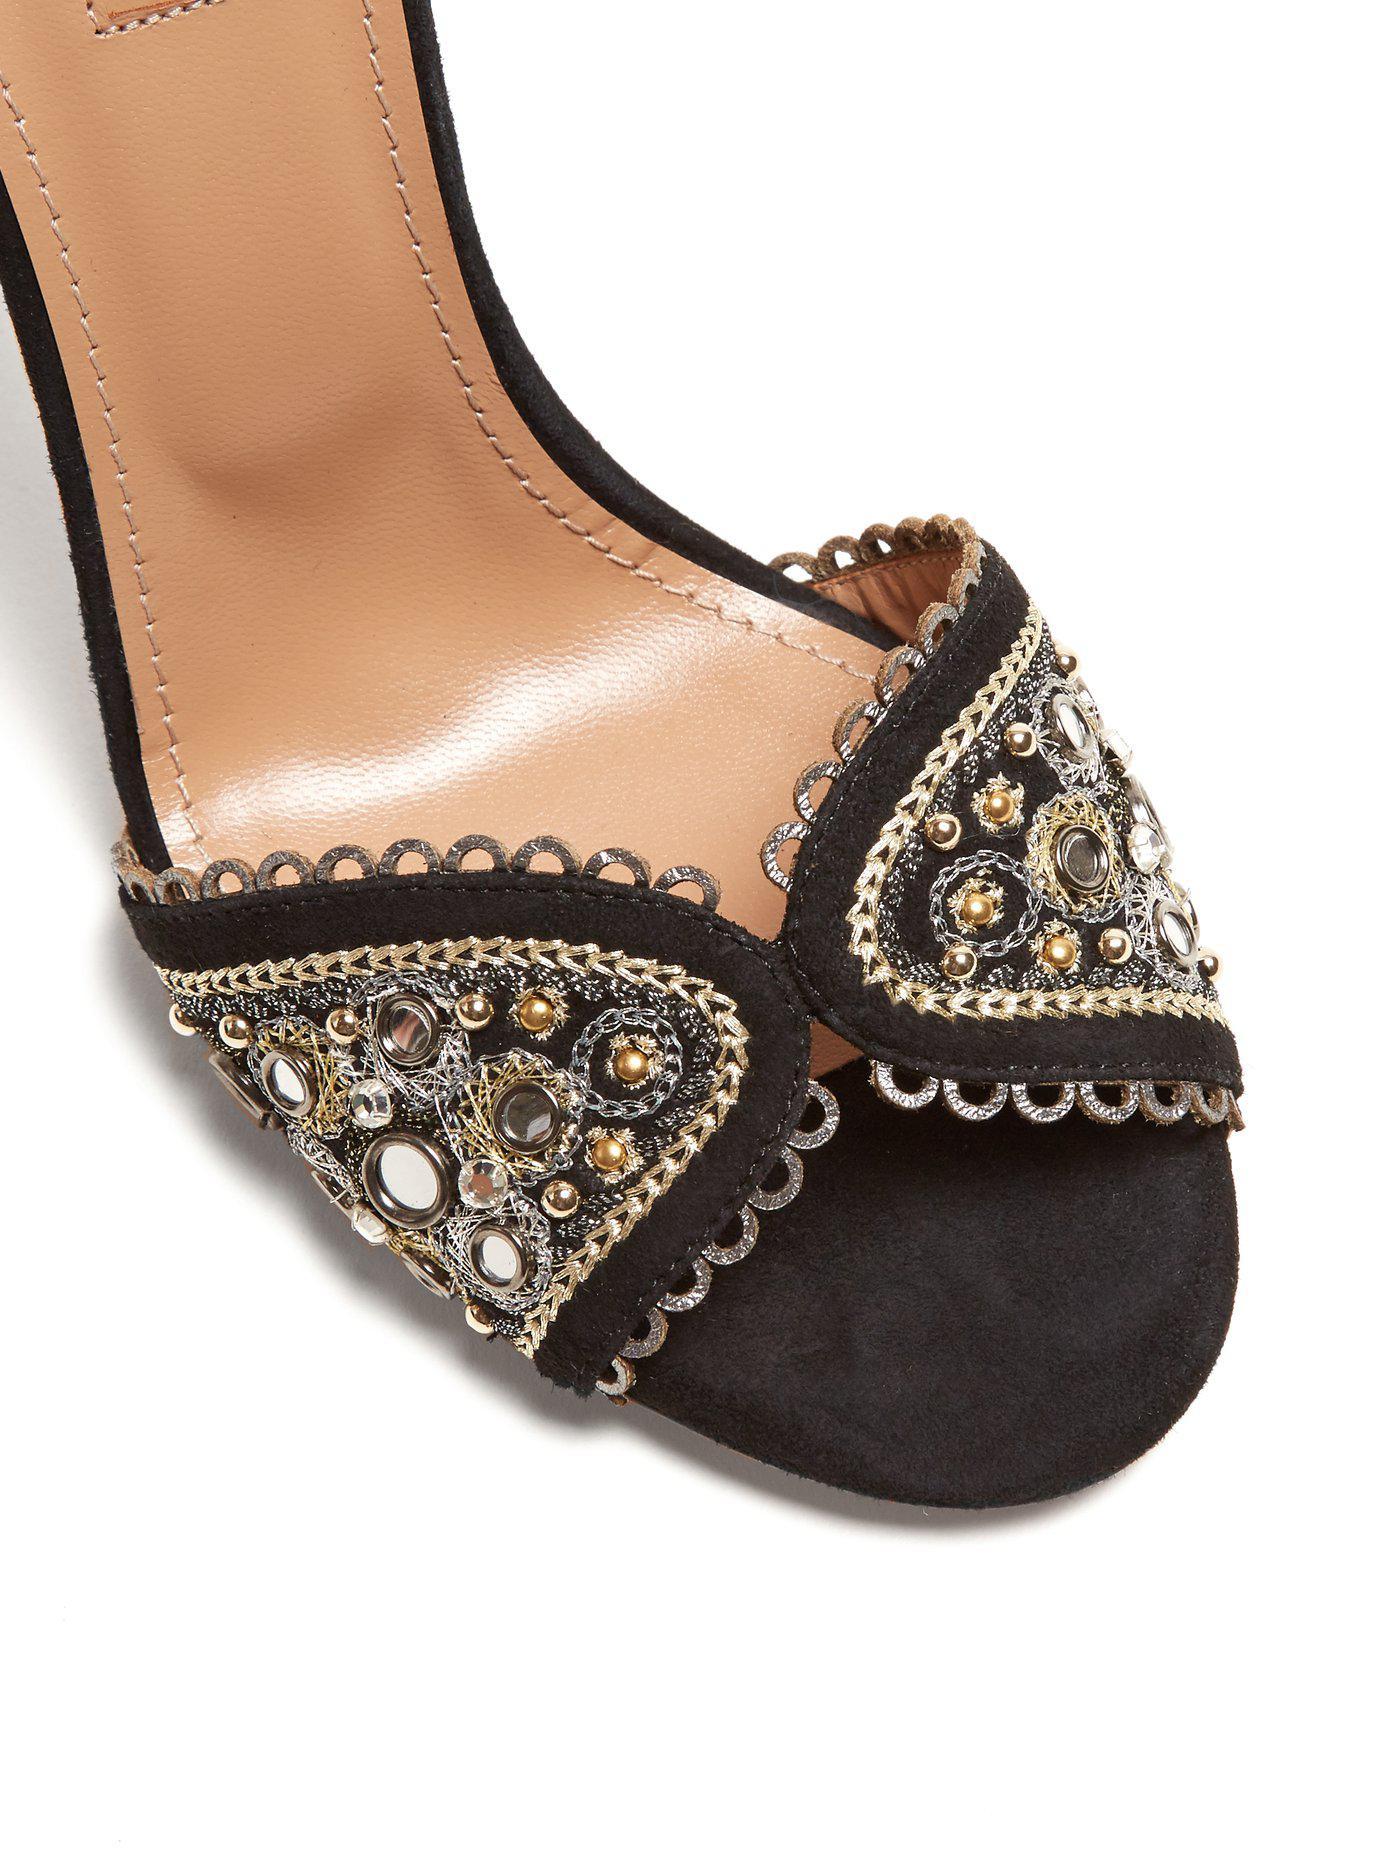 Sandales en daim brodées JaipurAquazzura KFDlaBw